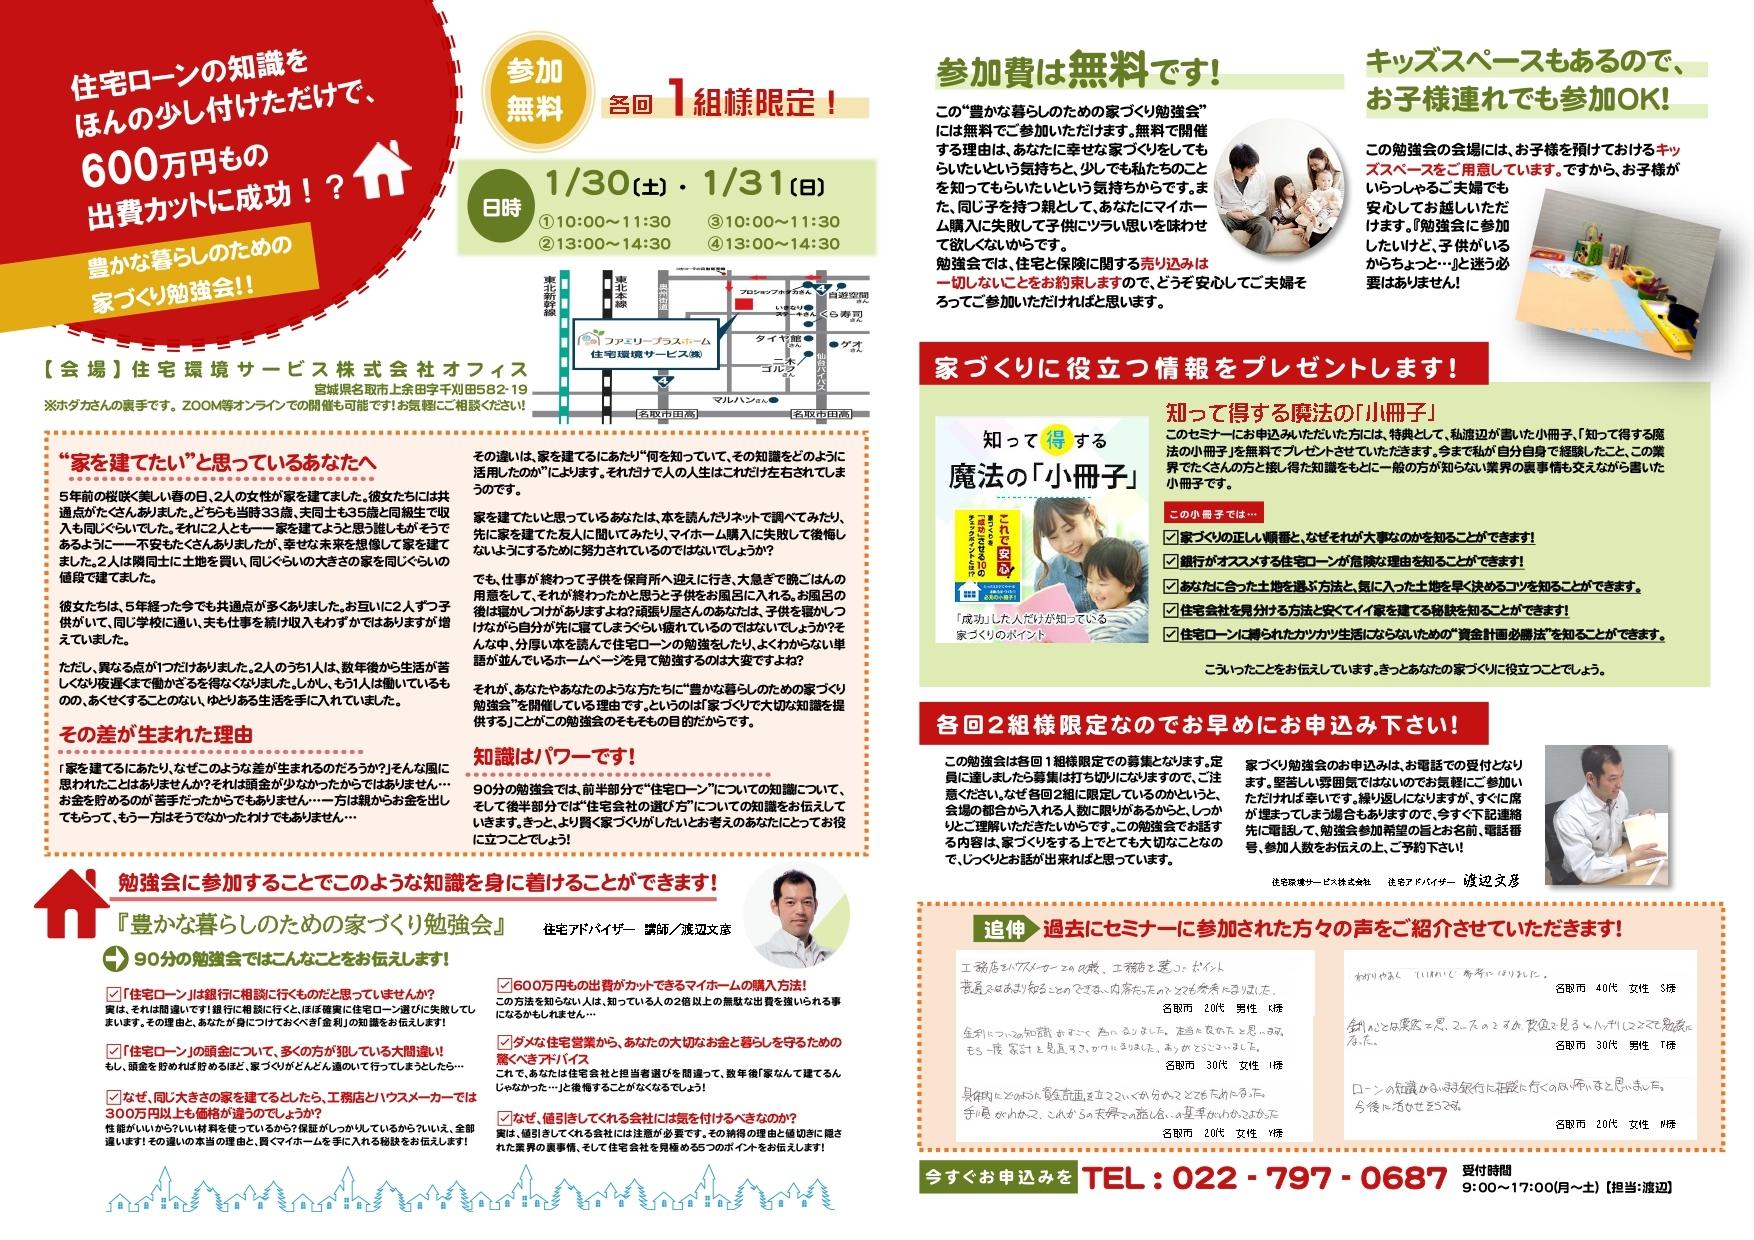 http://www.jutakukankyo-service.jp/2c7c949922a2bc81c814bcf5657ede845b7d8c92.jpg